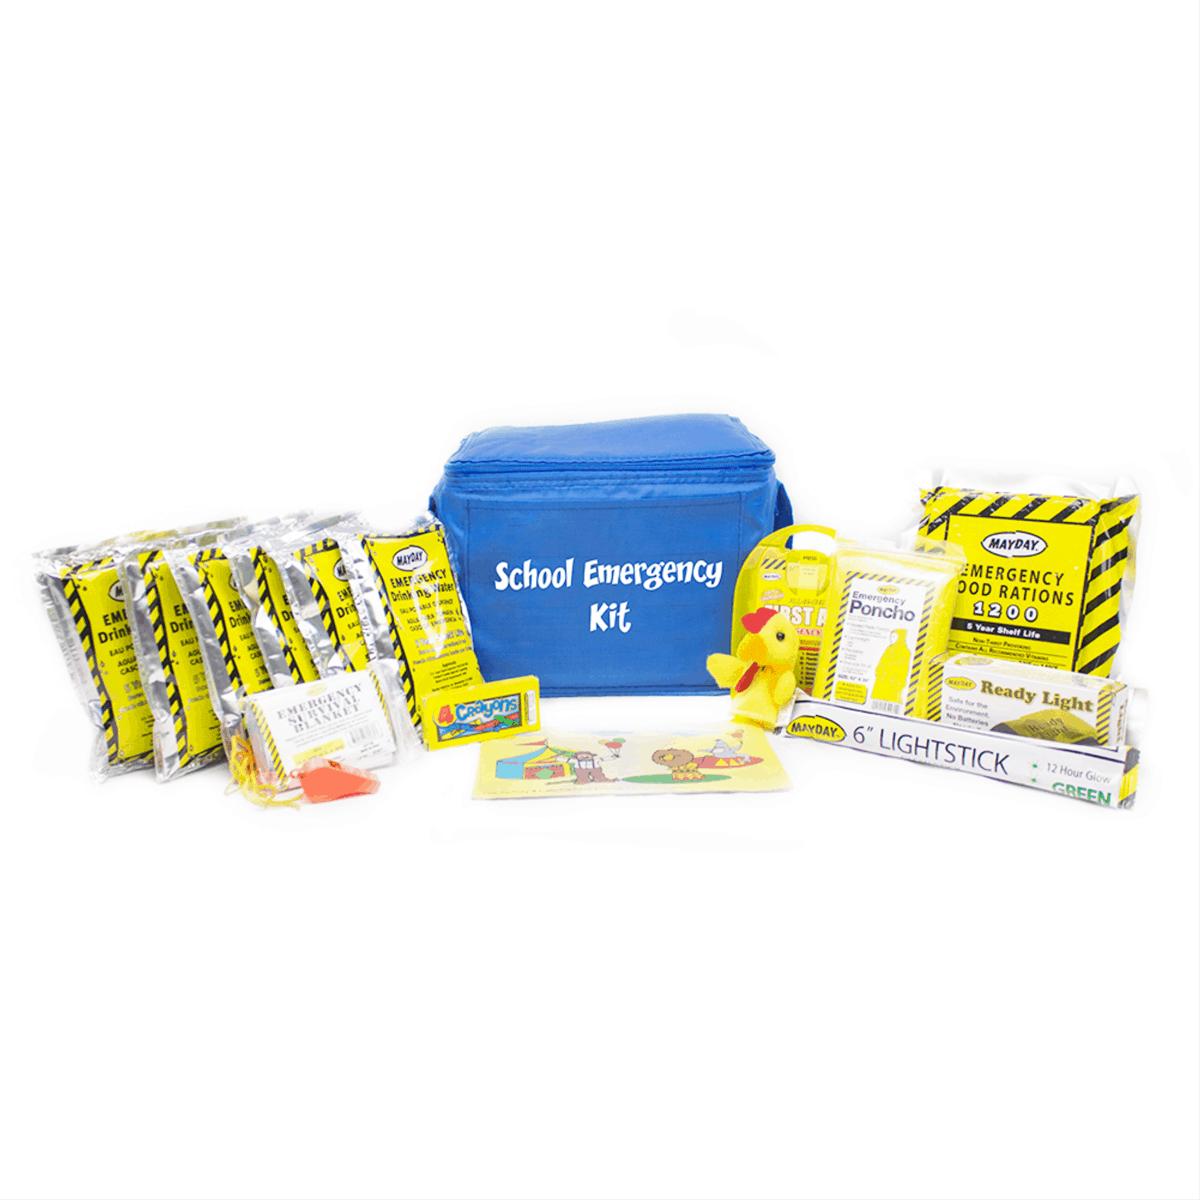 School Emergency Kit *New Improved* (18 Piece)